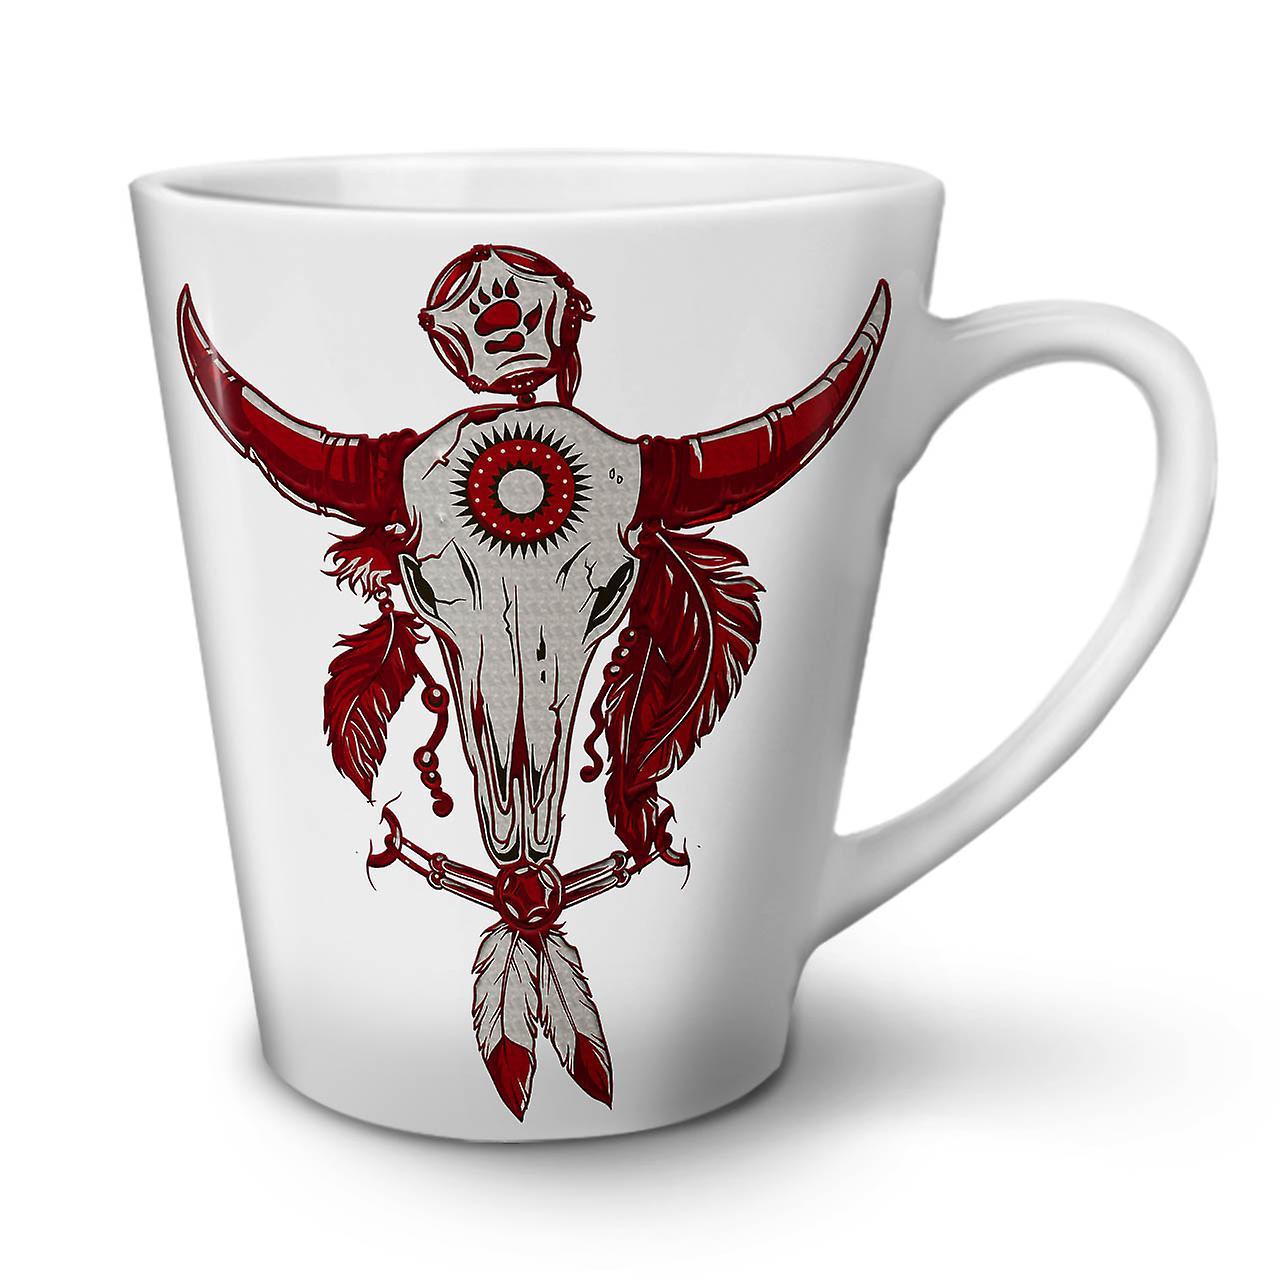 Thé Buffalo En Céramique 12 Blanc Crâne Café Mug Nouveau OzWellcoda Indien Latte fY7bgy6